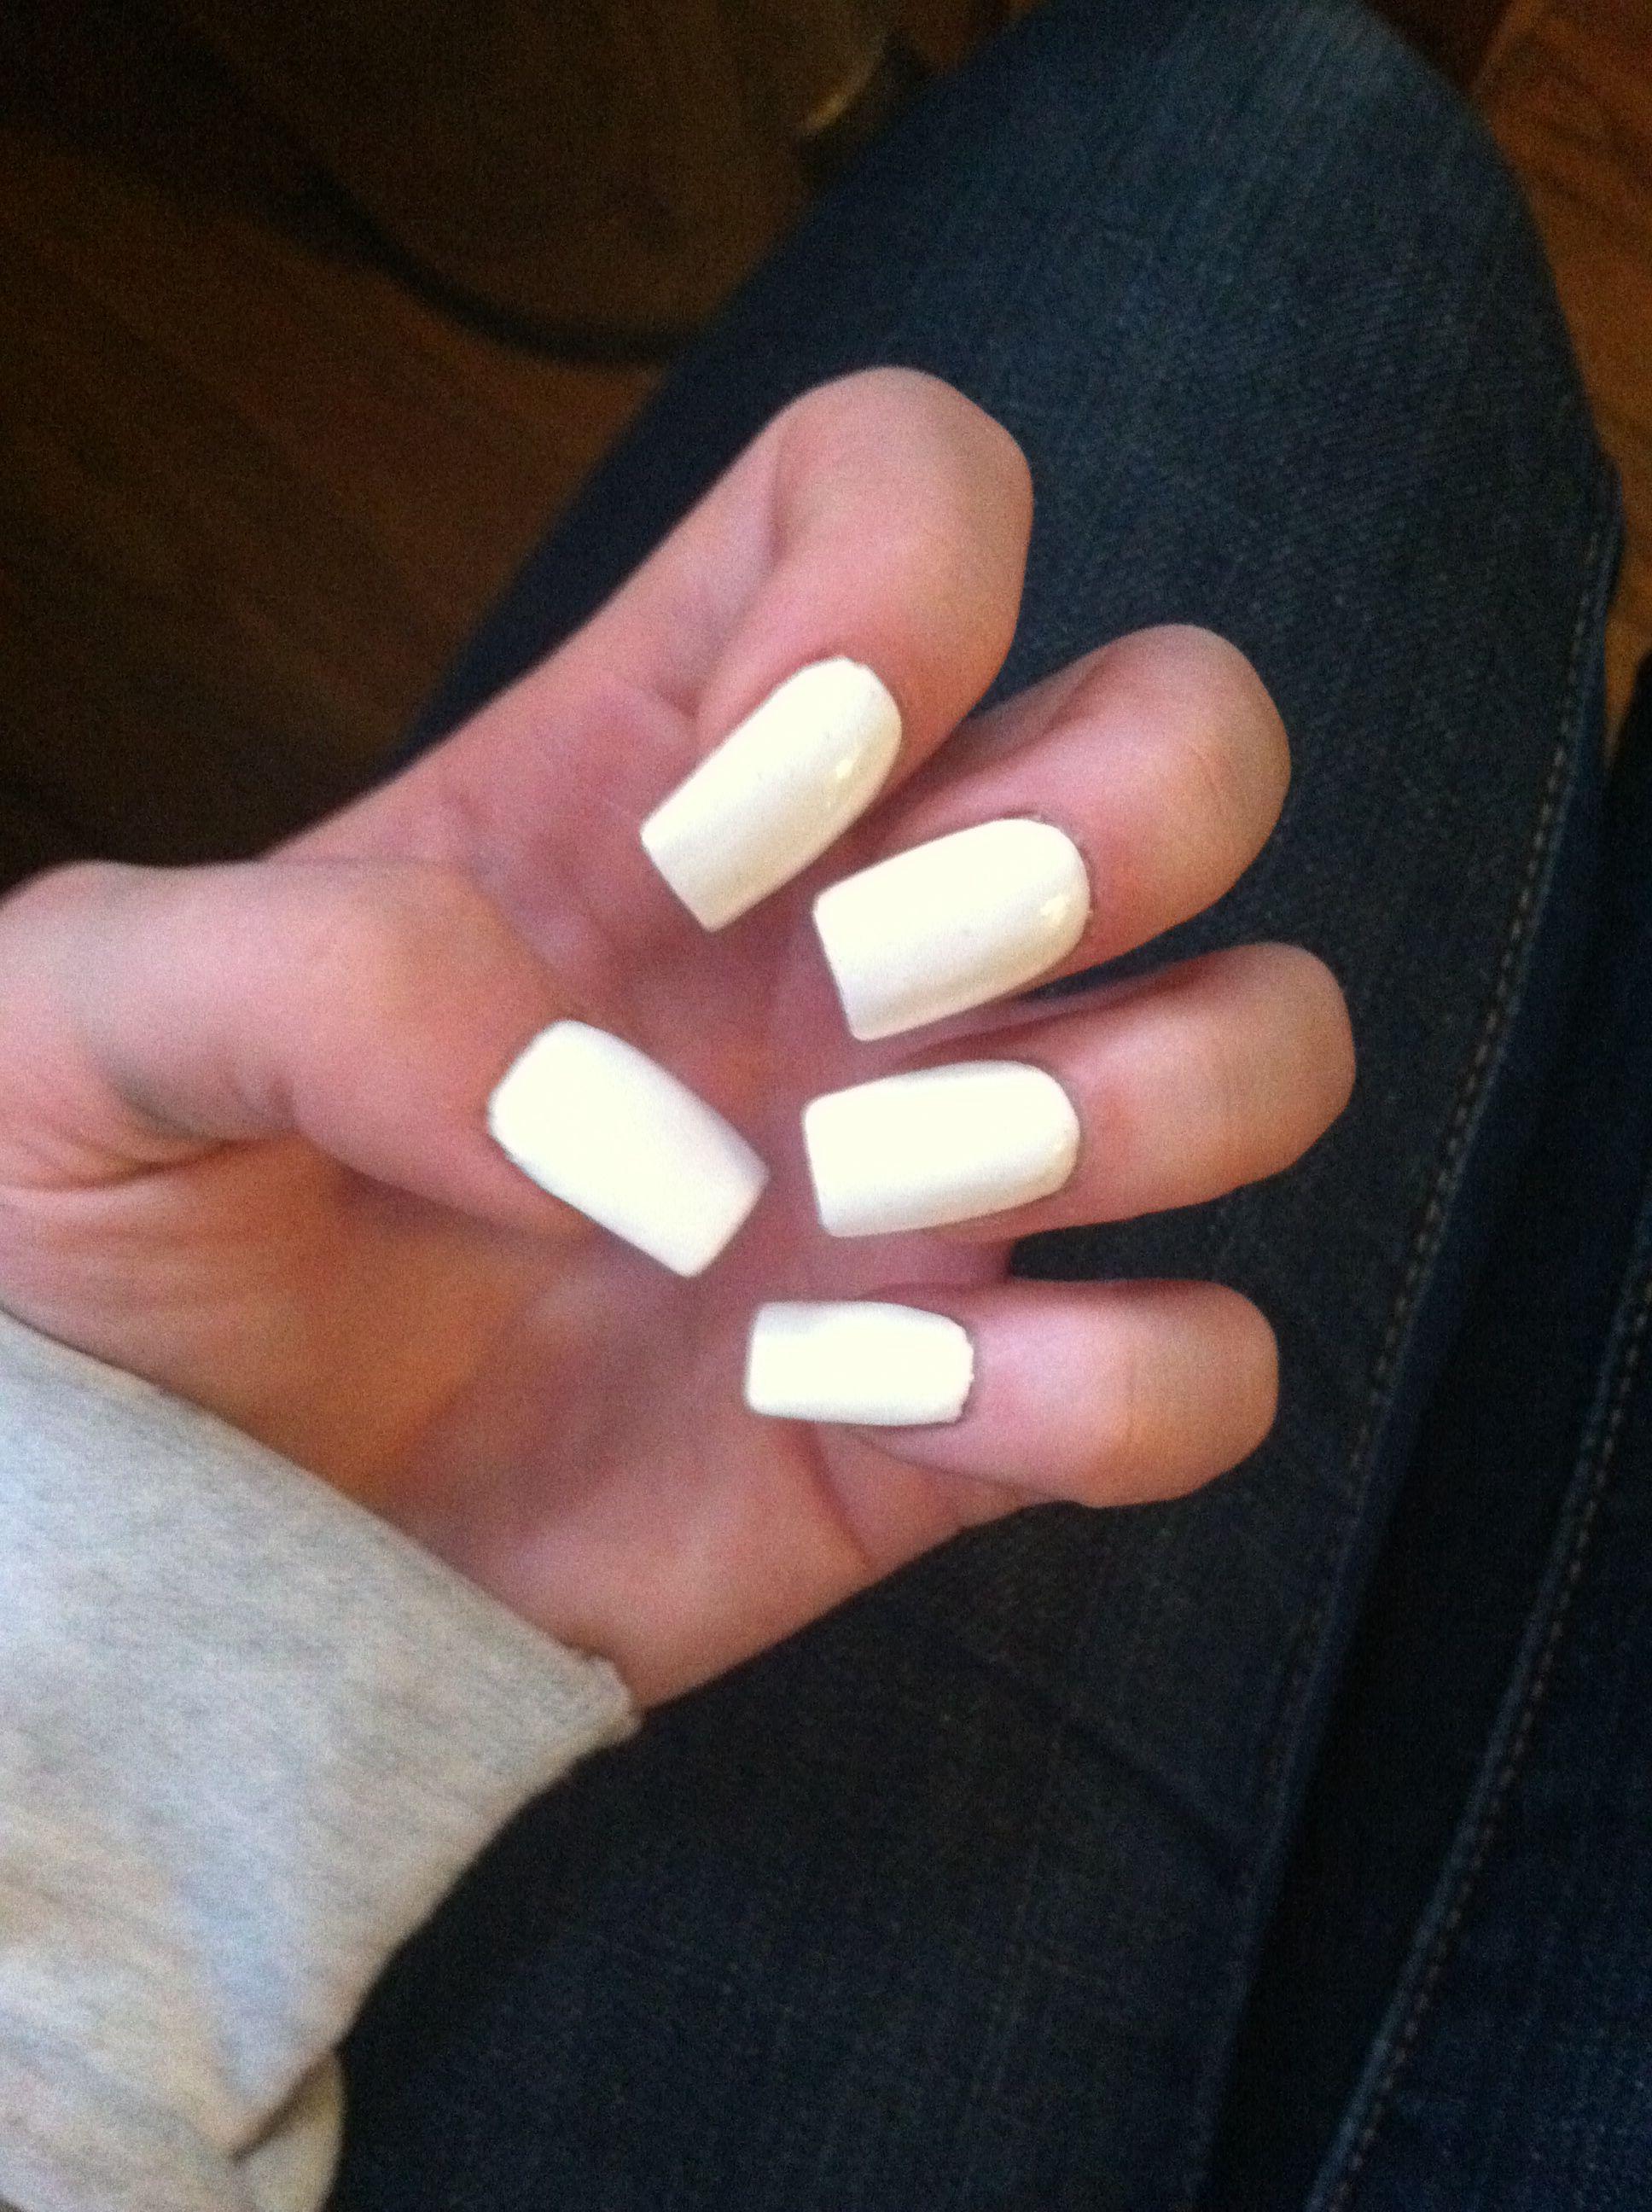 Kendall Jenner nails | Beauty Board | Pinterest | Kendall jenner ...